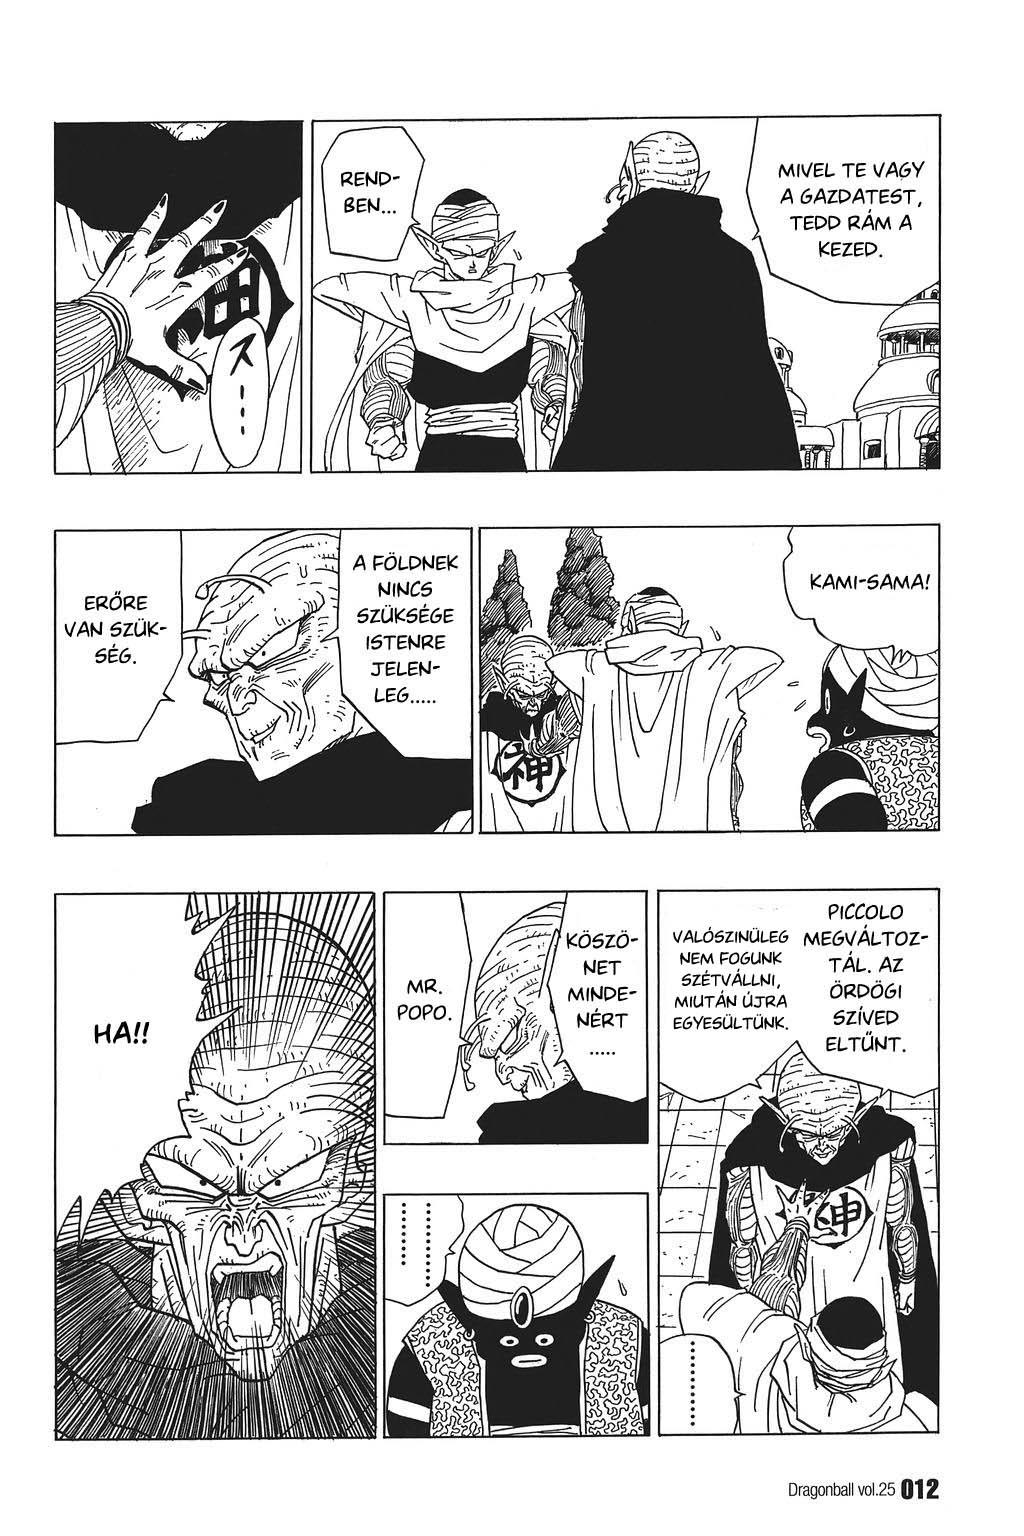 naruto-kun.hu/manga/mangas/Dragon%20Ball/360/012.jpg